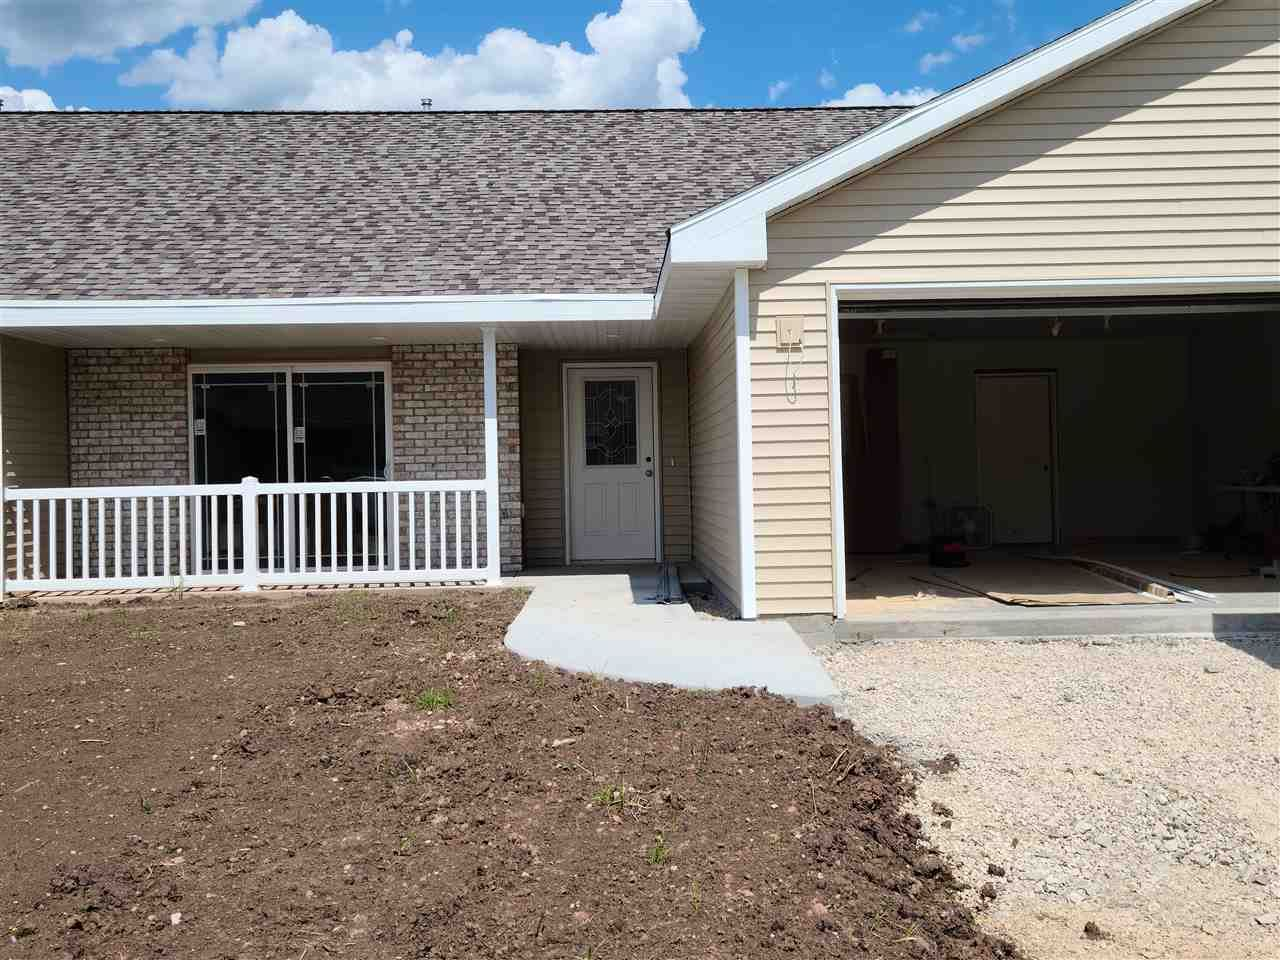 122 STONE CASTLE Drive, Fond du Lac, WI 54935 - MLS#: 50231526